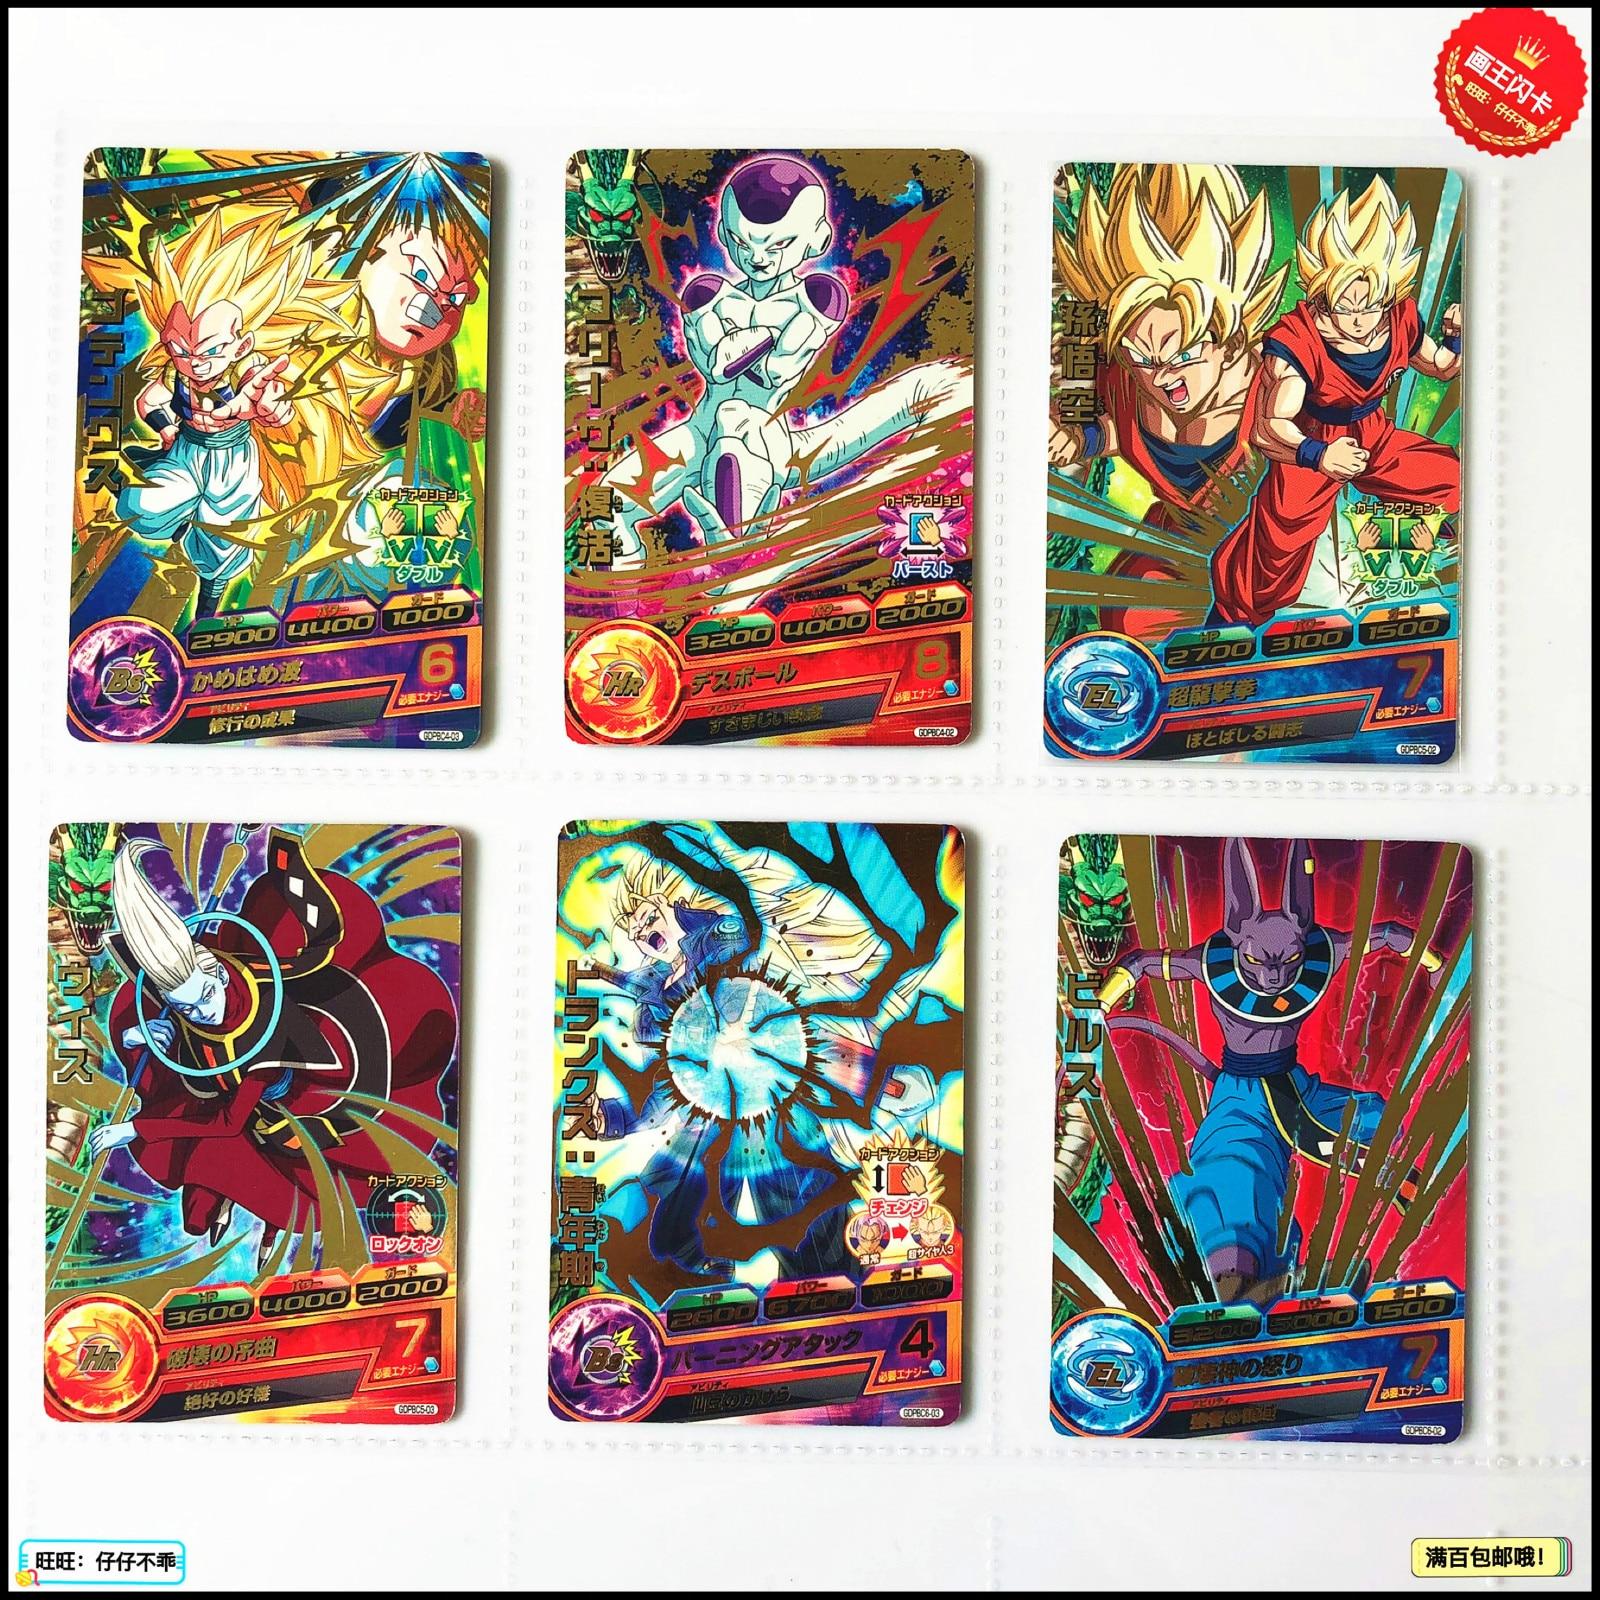 Japan Original Dragon Ball Hero Card GDPBC4 5 6 Goku Toys Hobbies Collectibles Game Collection Anime Cards